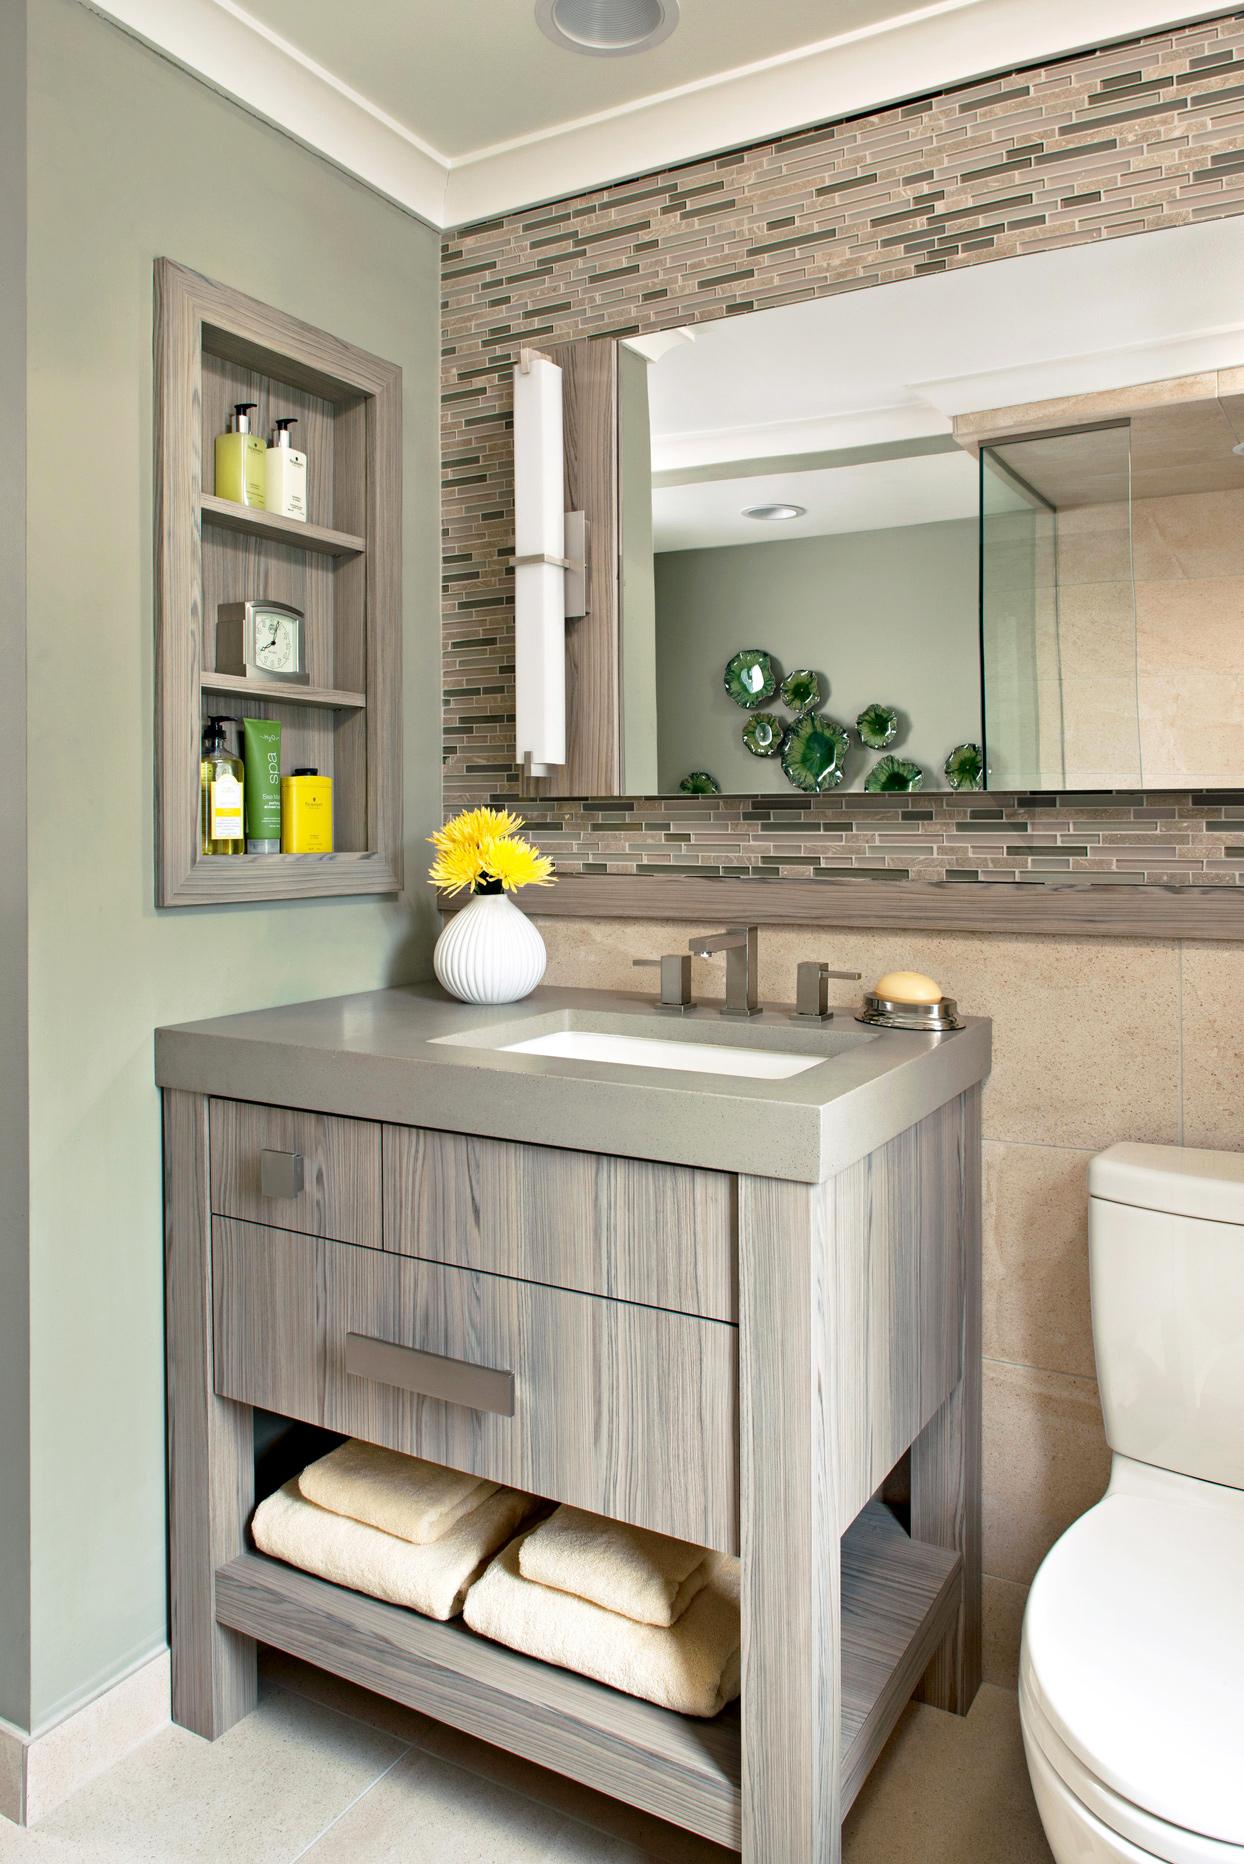 20 Small Bathroom Vanity Ideas That Pack in Plenty of Storage